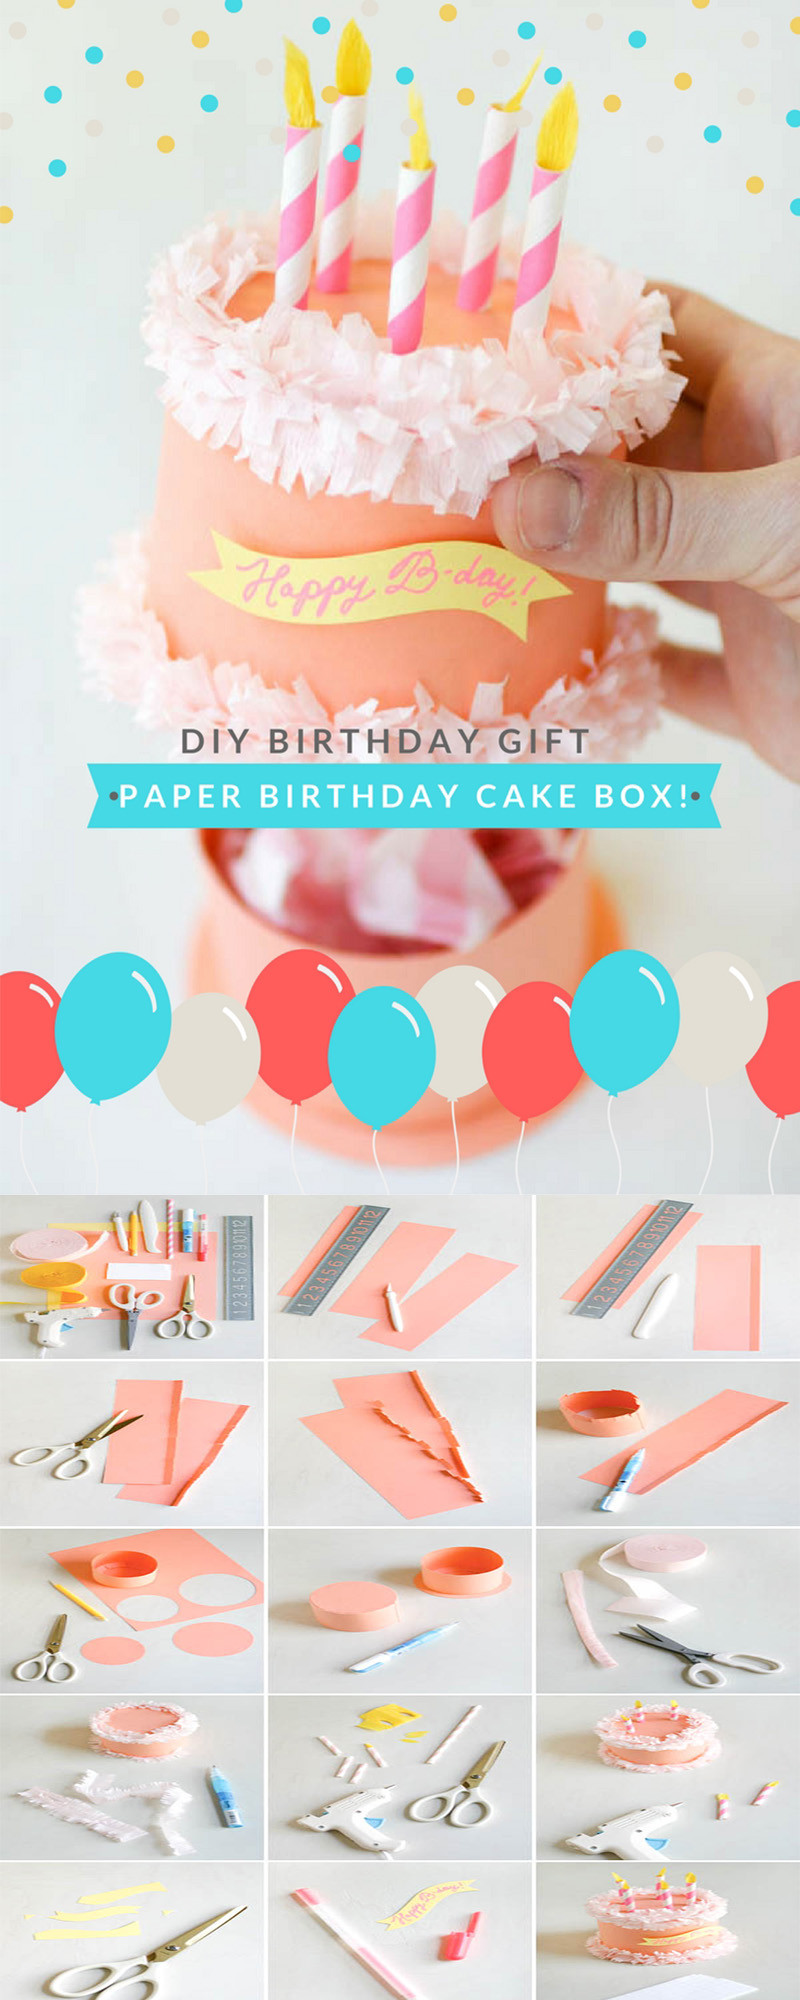 DIY Boyfriend Birthday Gifts  DIY Gift Ideas for Your Boyfriend Paper Birthday Cake Box